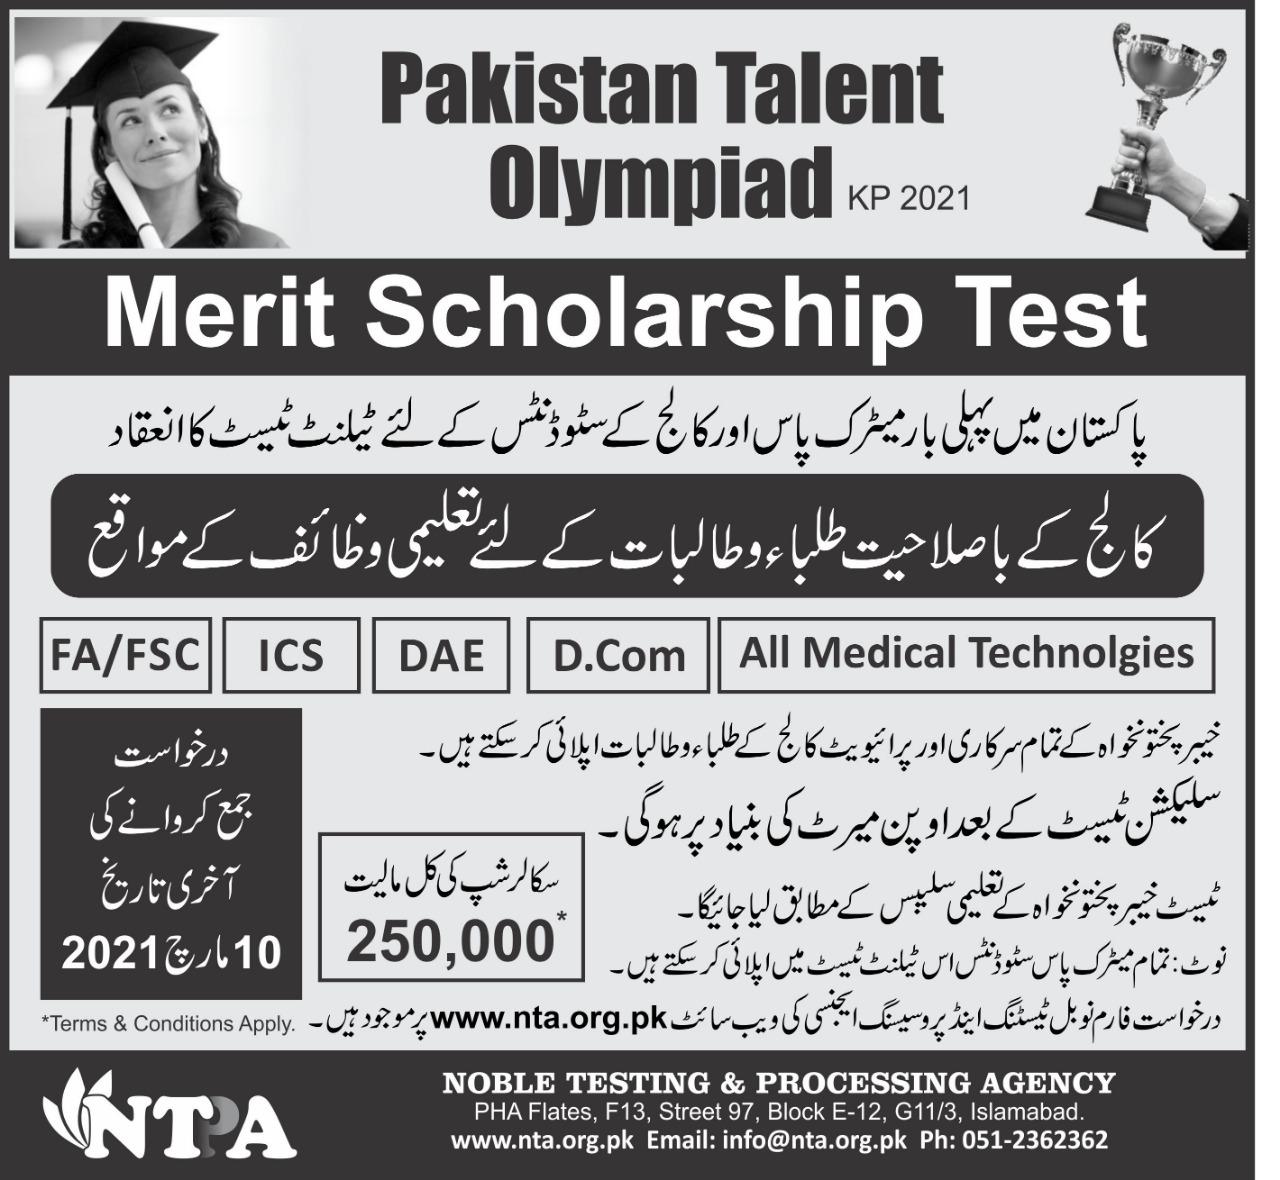 Pakistan Talent Olympiad KPK Merit Scholarship Test NTPA Roll No Slip